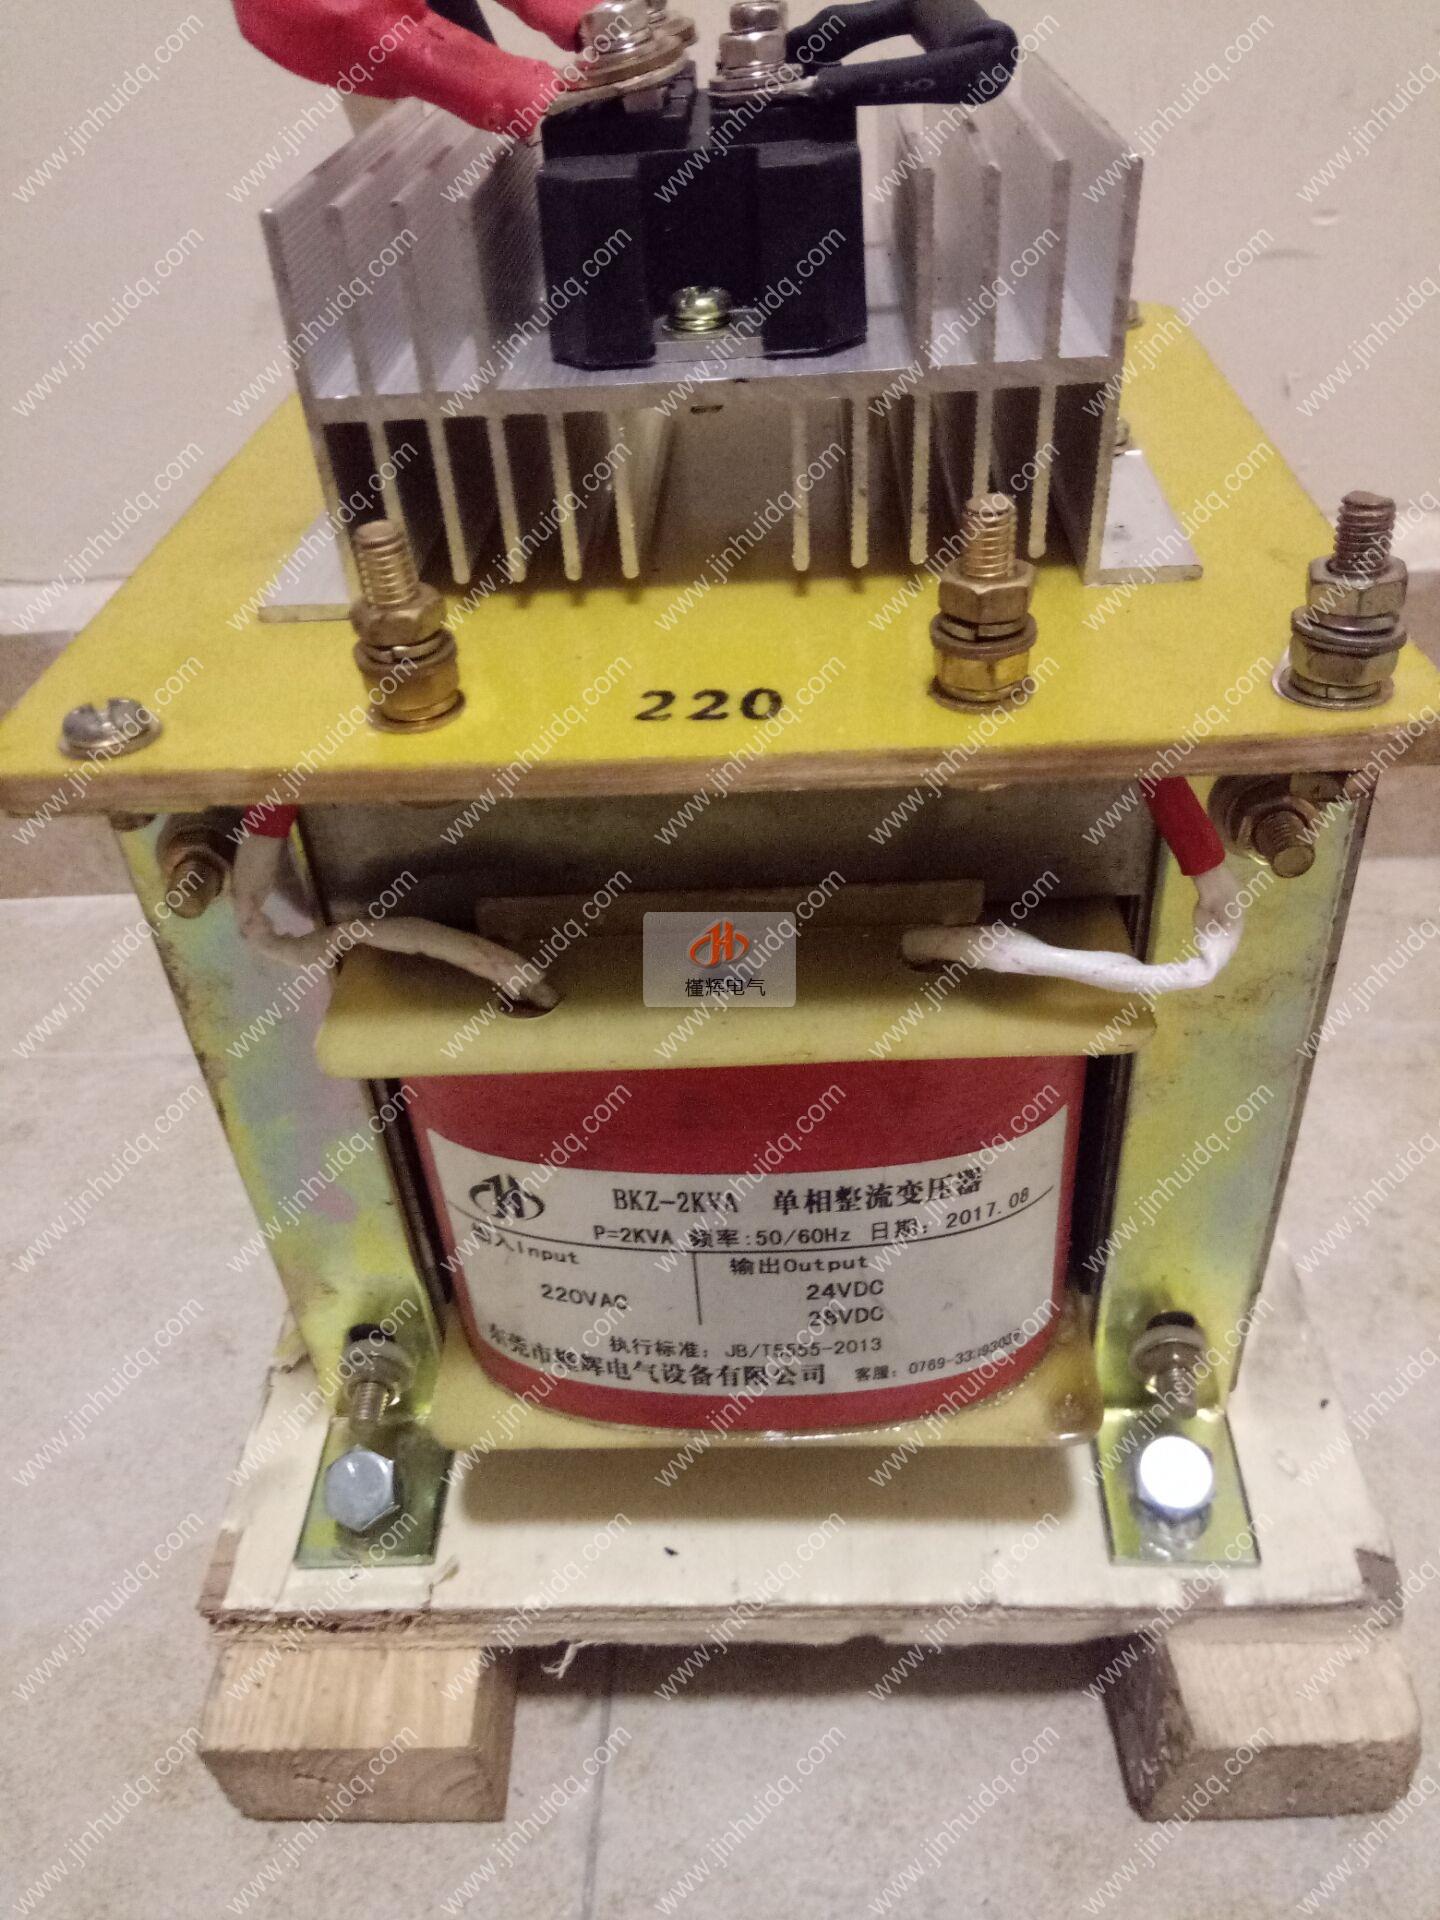 BKZ-4KVA220VAC променлива 24 vdc електрическо монофазна трансформатор ac 220v до вашингтон 24V4KW